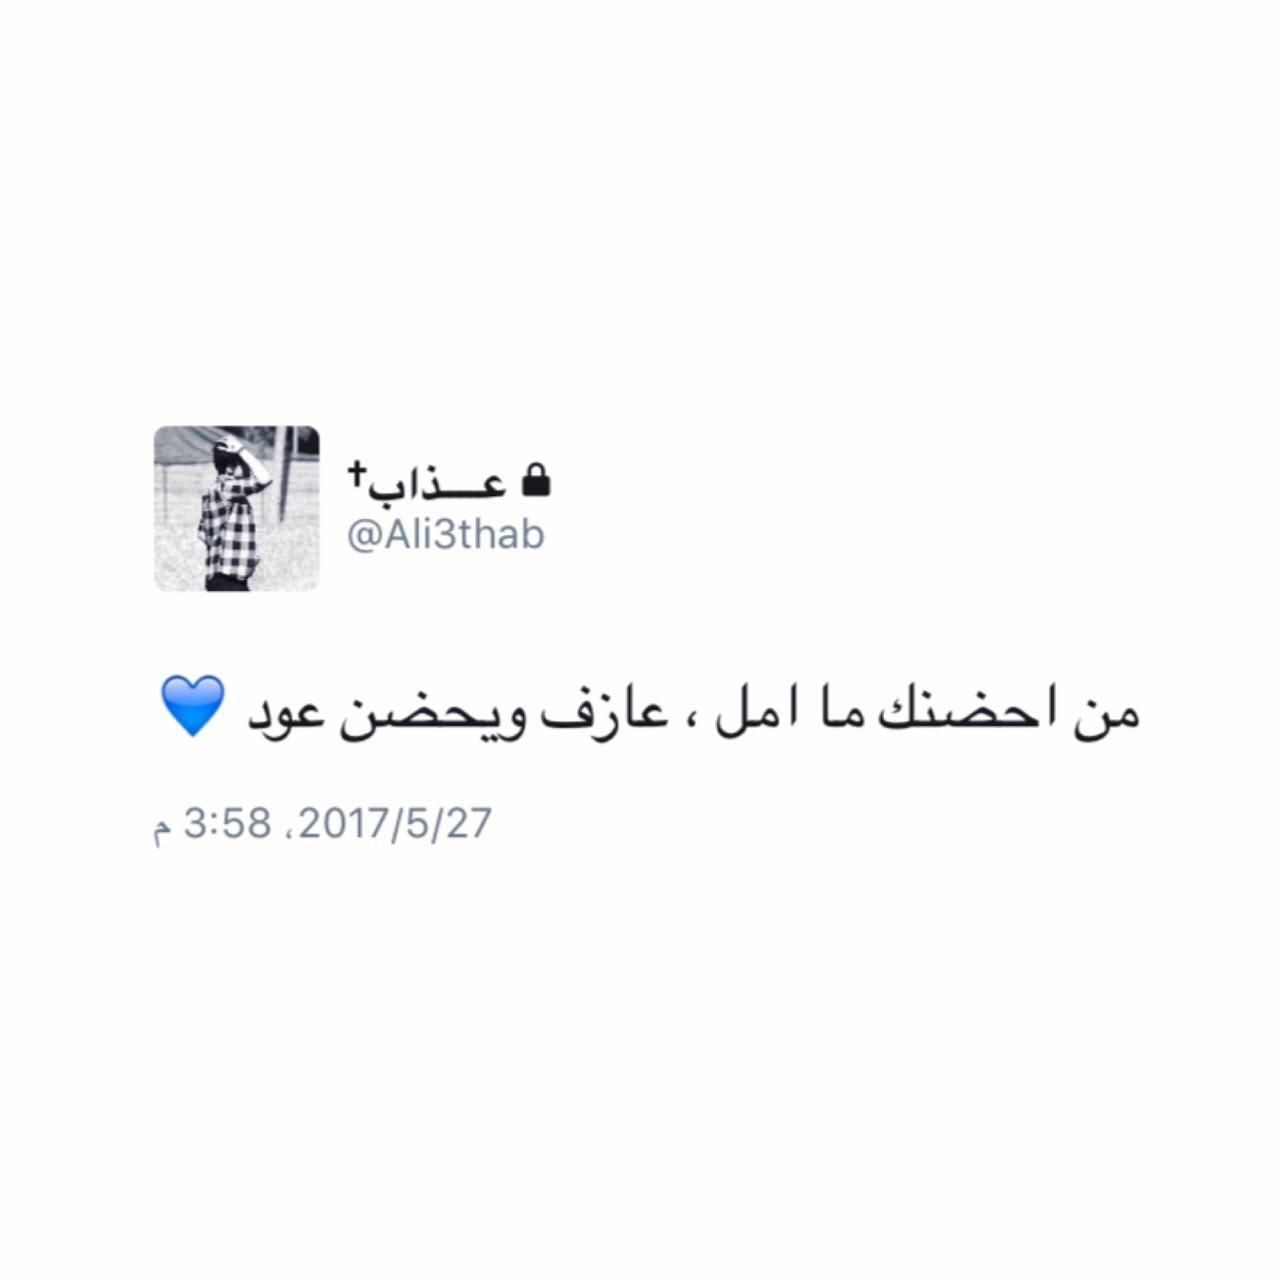 عتابً, وَجع, and شعر شعبي image